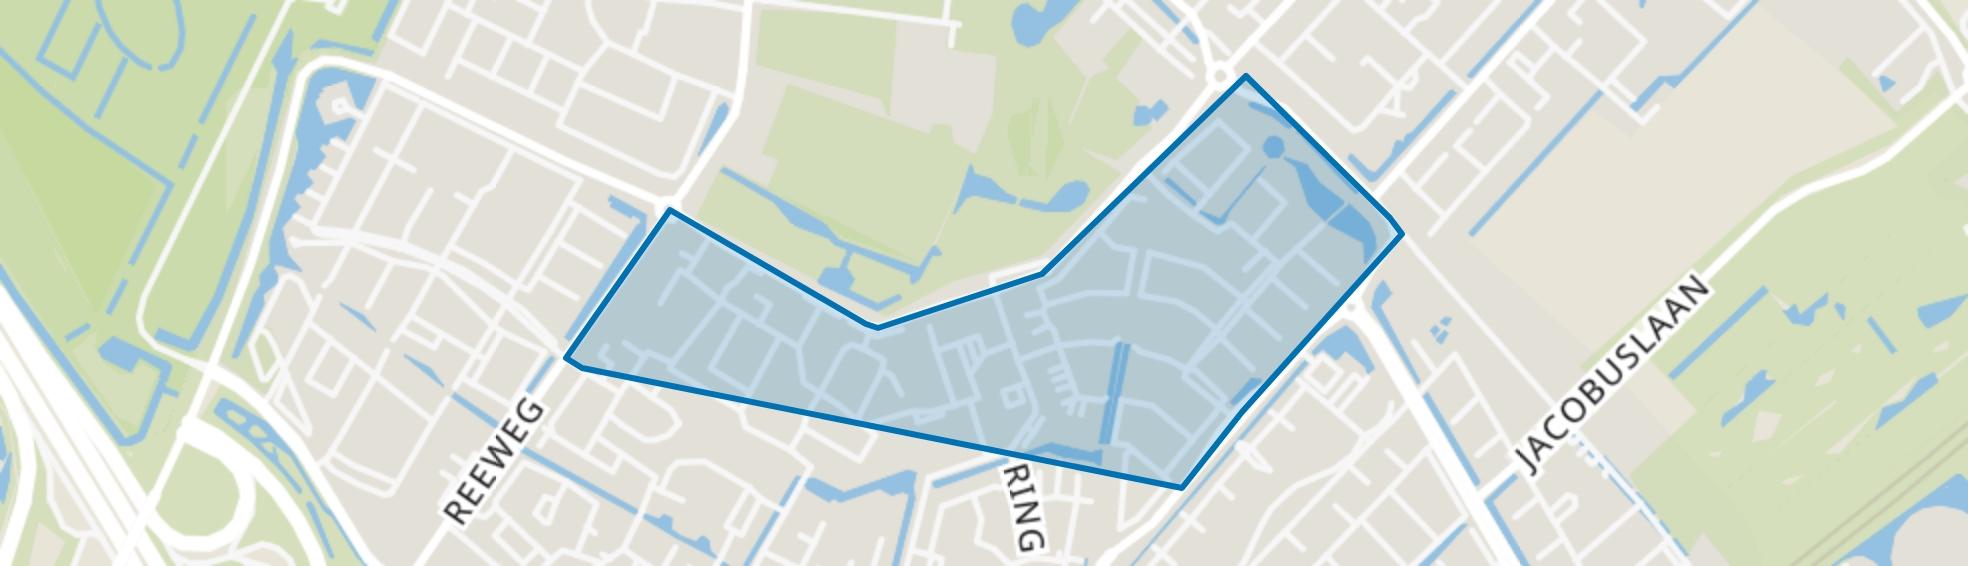 Krommeweg-Noord, Hendrik-Ido-Ambacht map